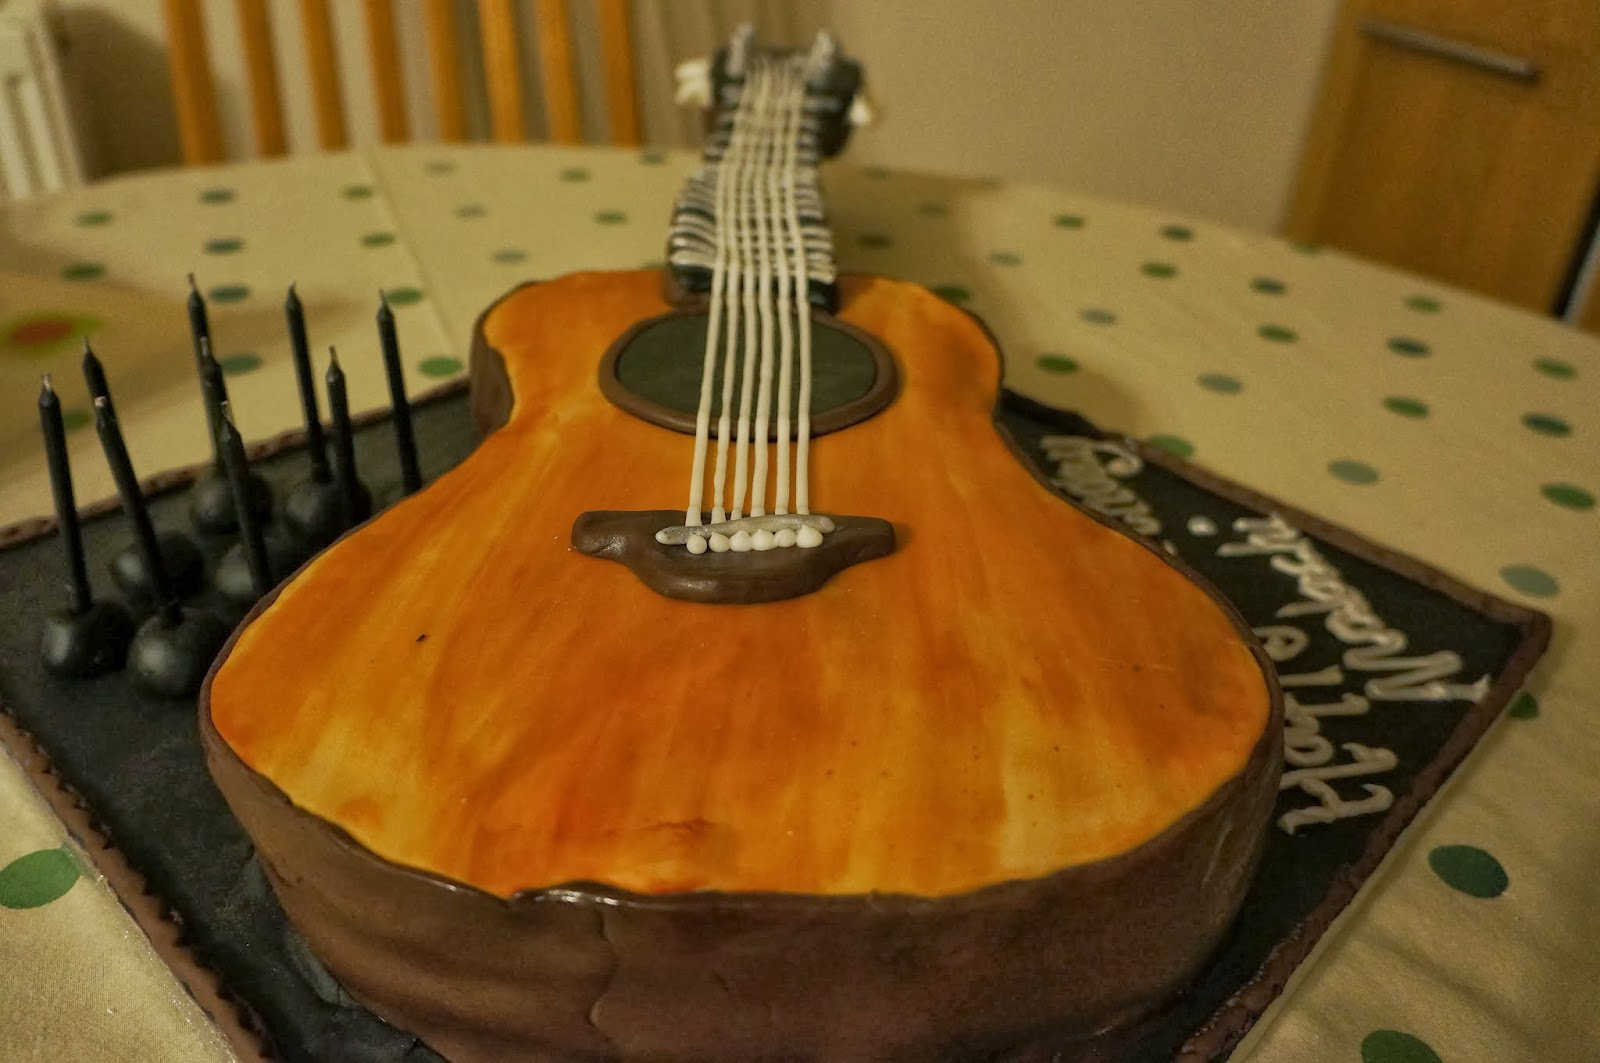 Guitar Birthday Cake Images : eatbakecake: cake...the acoustic guitar birthday cake